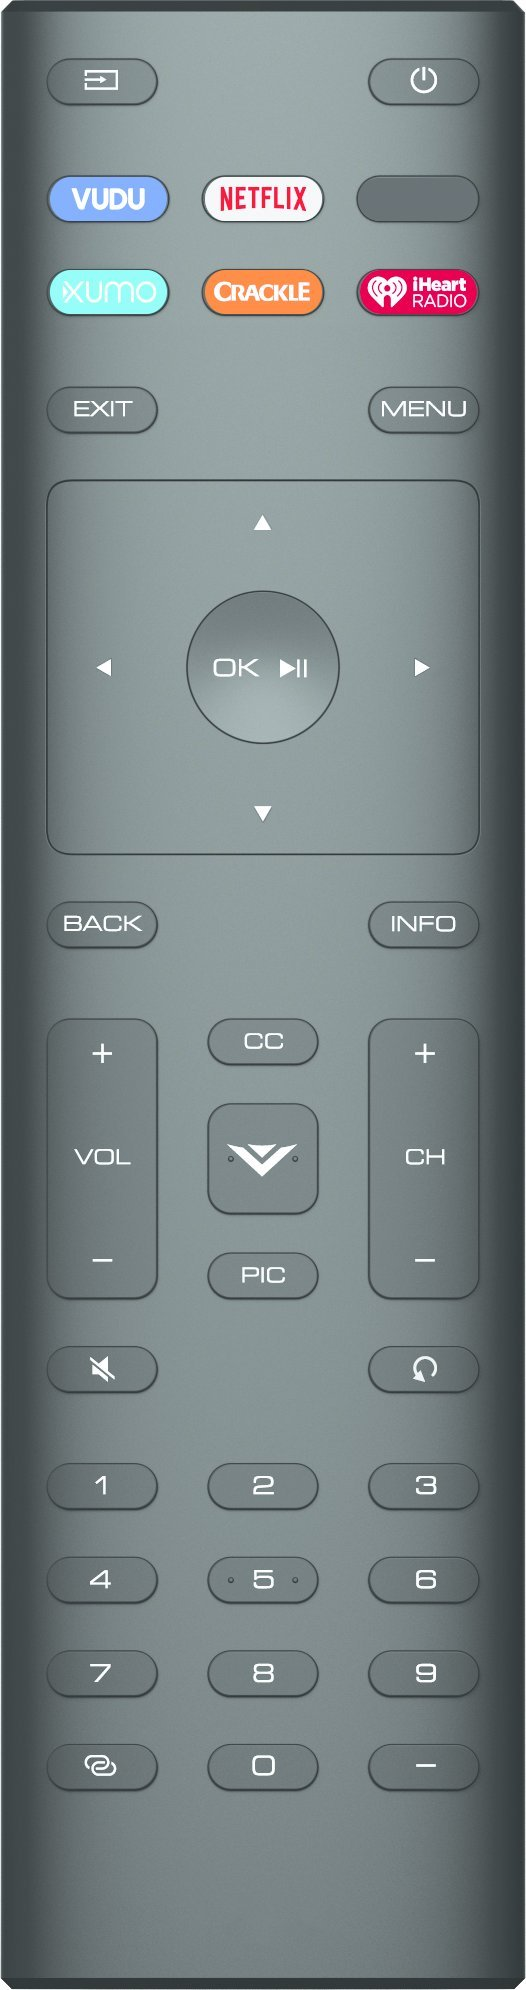 Xtrasaver Remote Control 2017 Model  compatible with Vizio XRT136